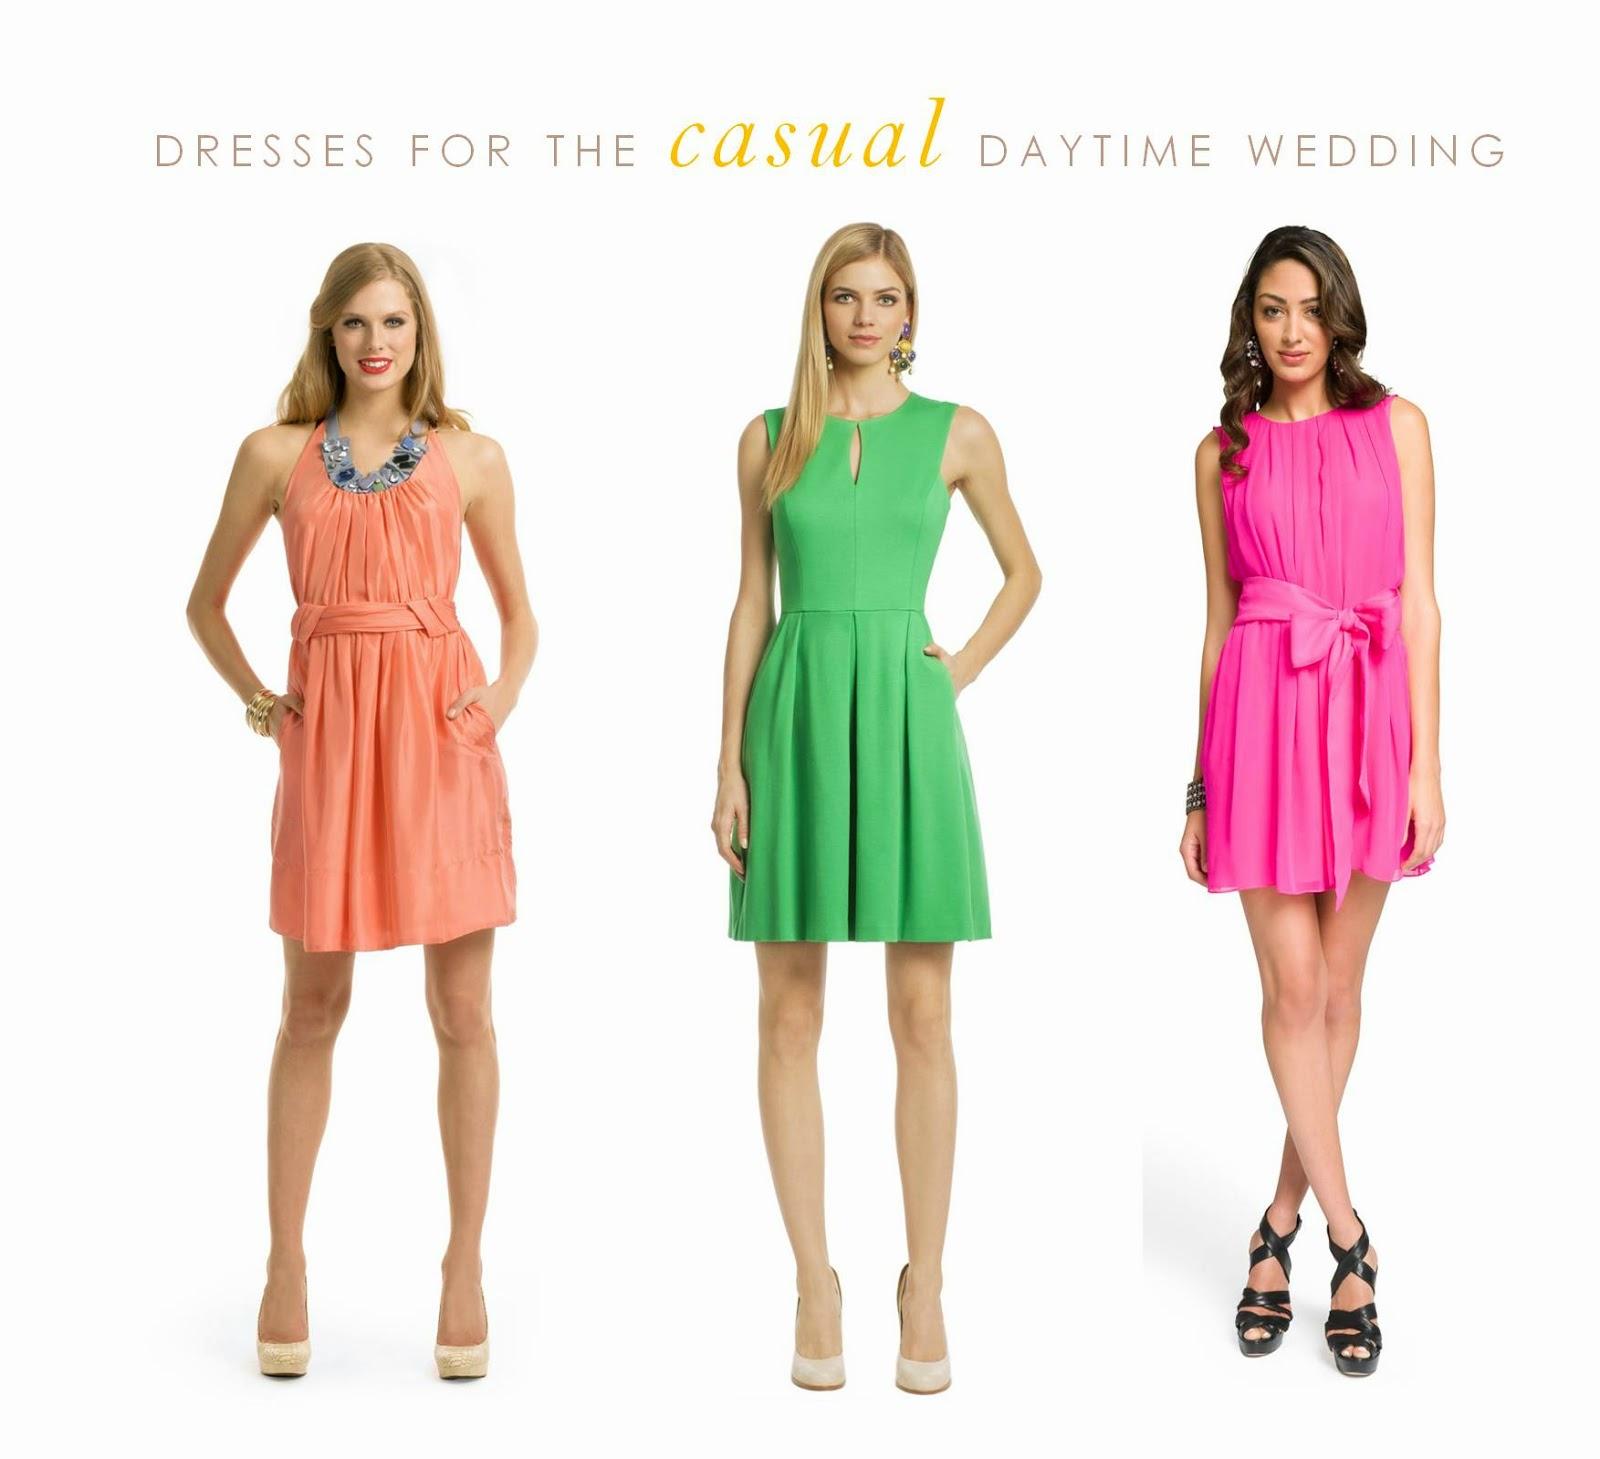 Trendy casual wedding guest attire bridal wedding ideas for Trendy wedding guest dresses